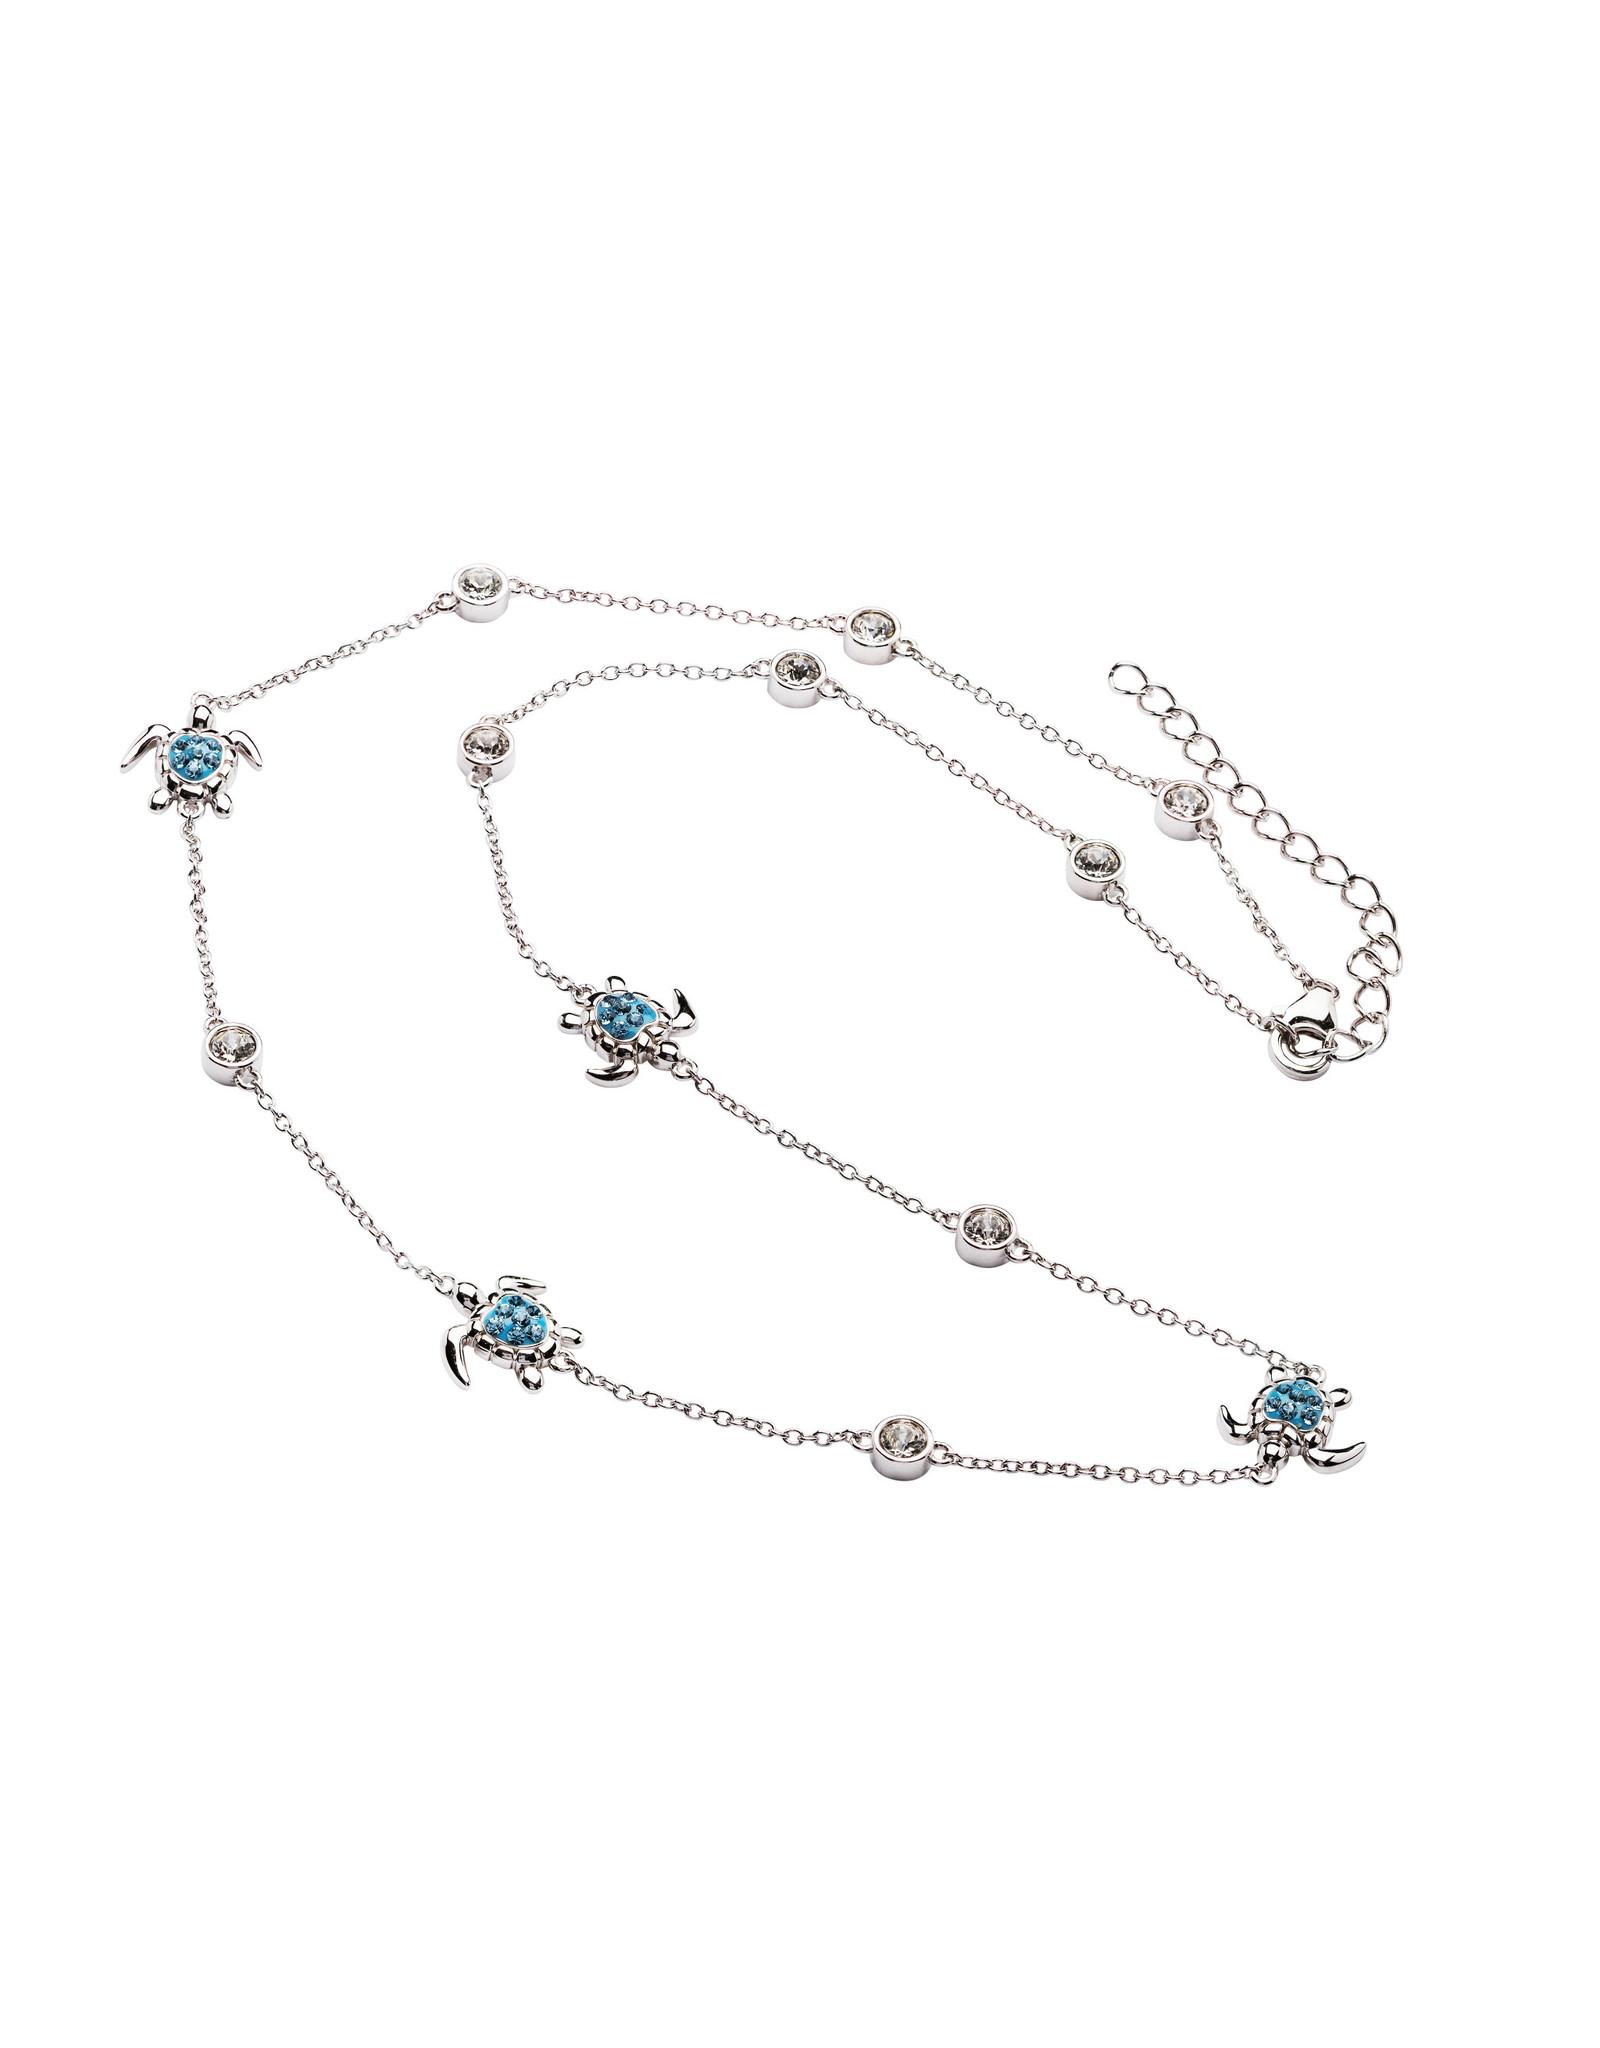 Ocean Jewelry Aqua Turtle Necklace